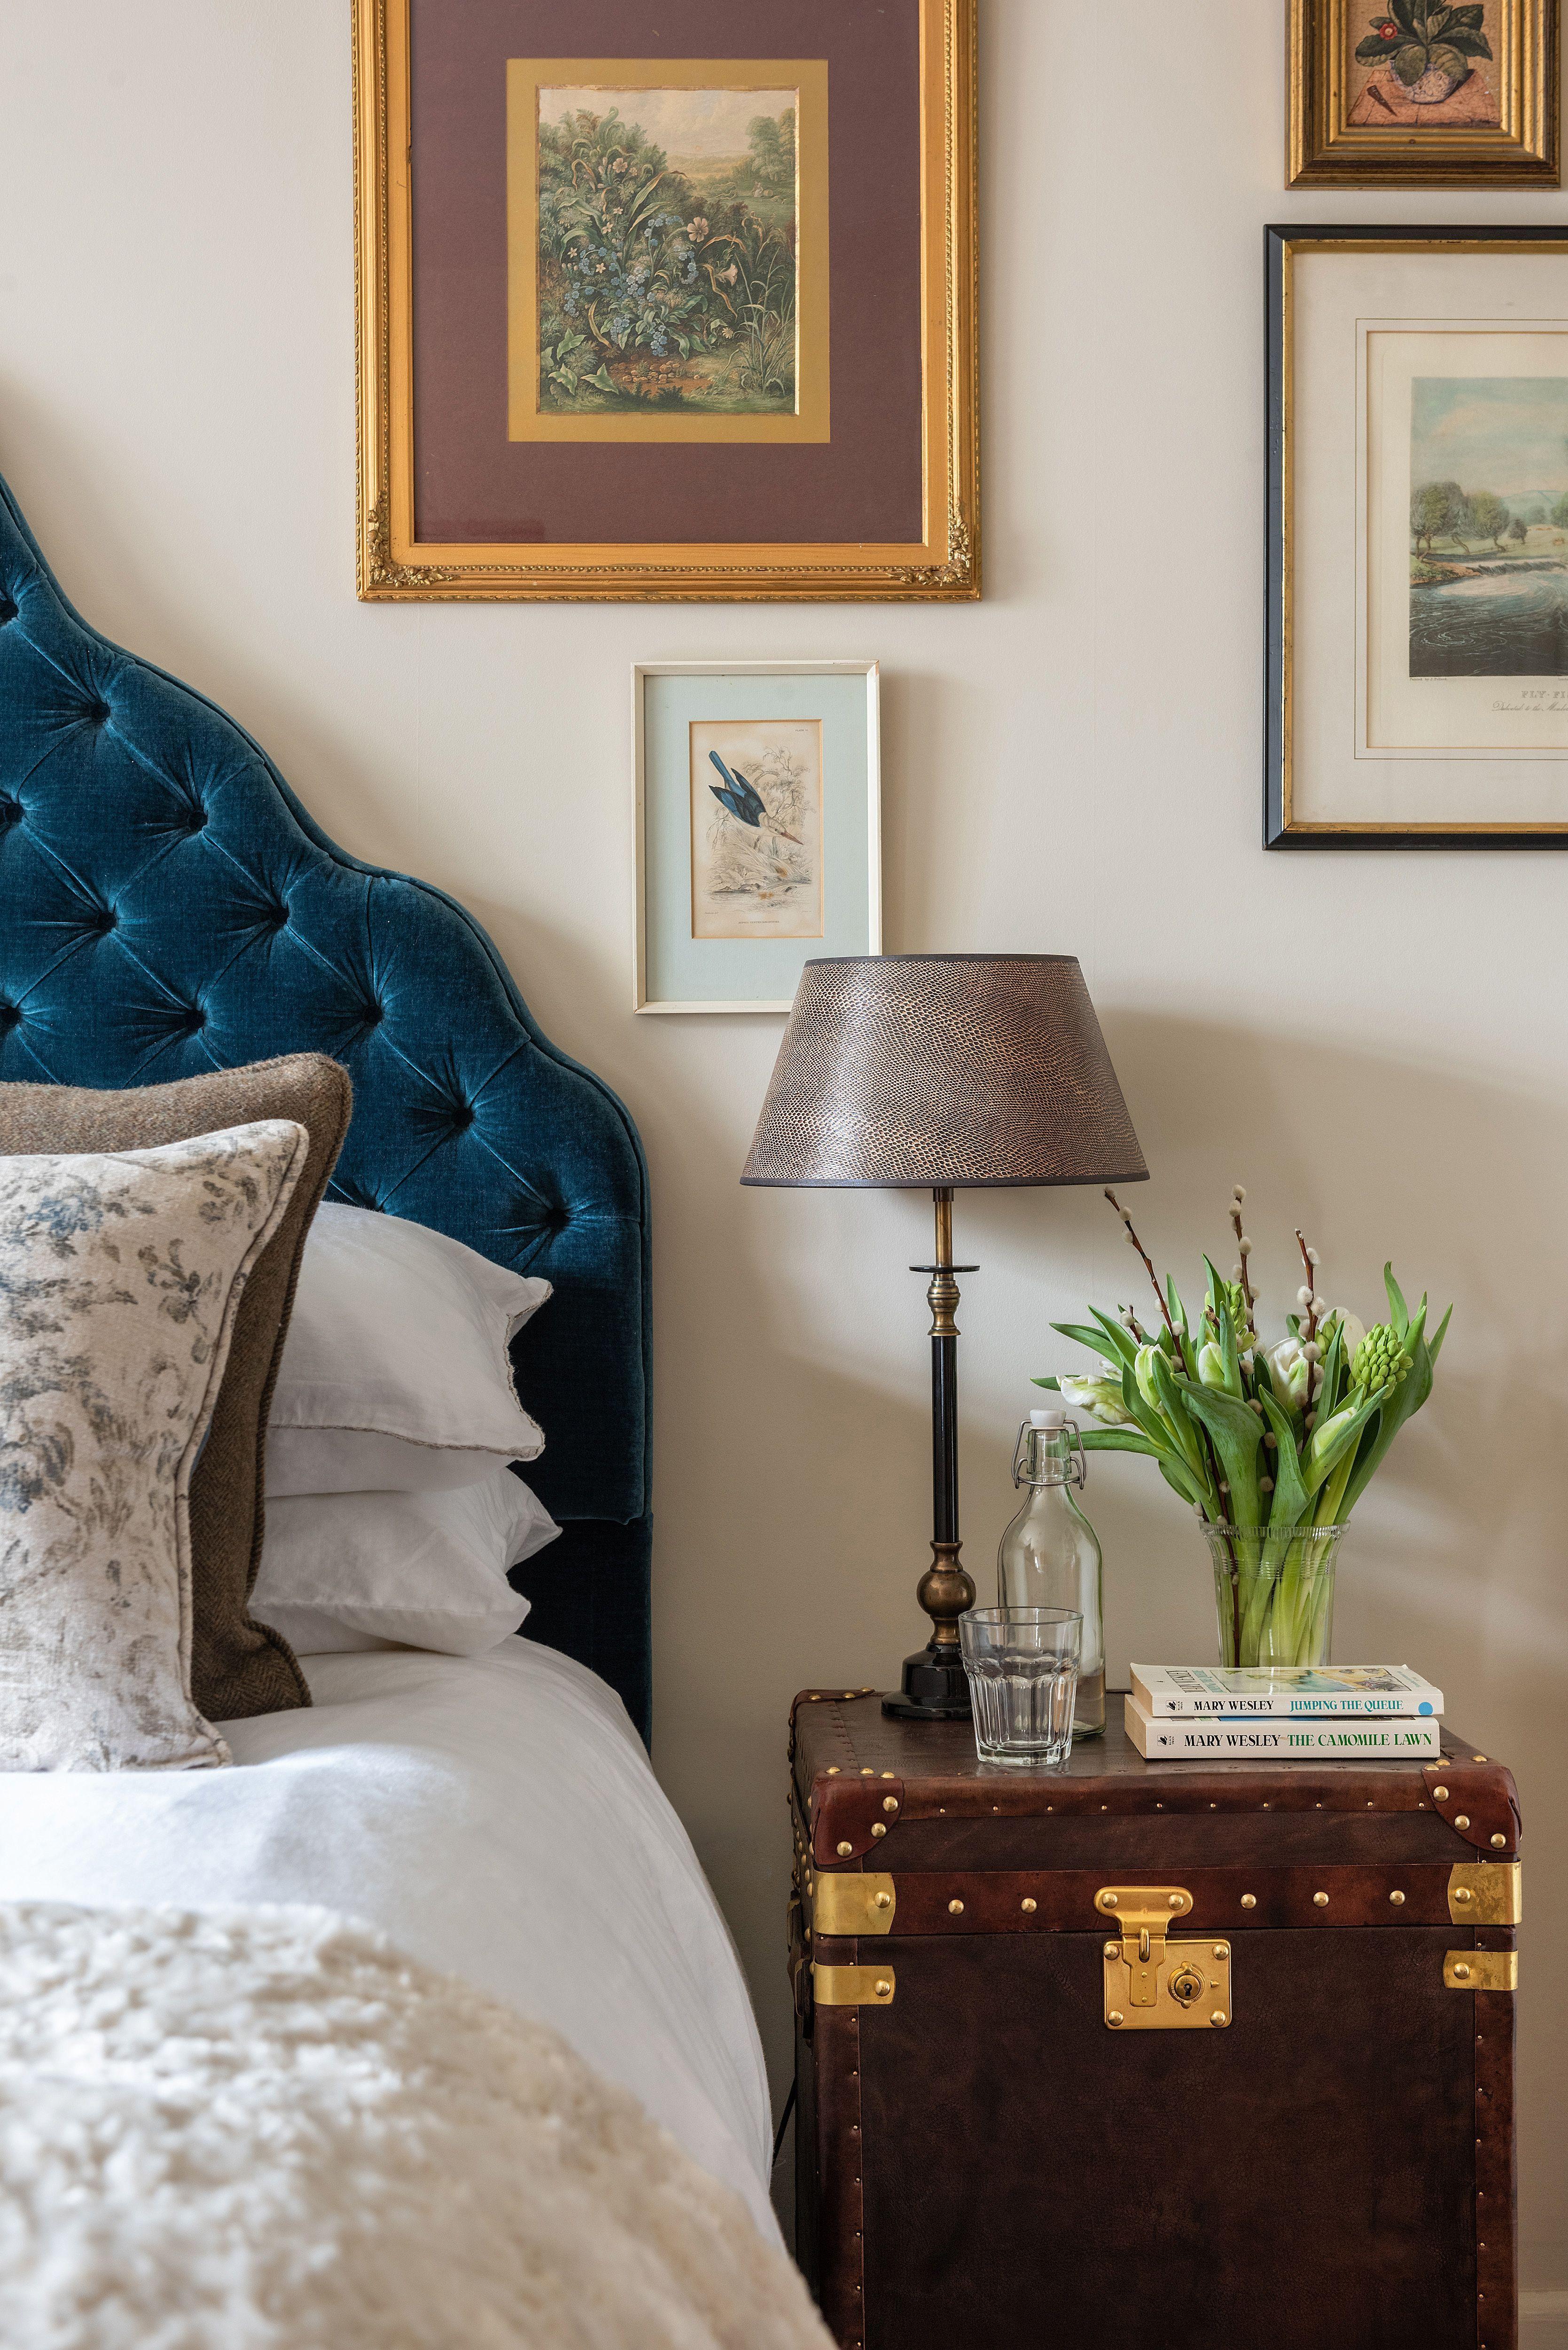 thornworthy barn s side table in the bedroom is utterly divine rh co pinterest com